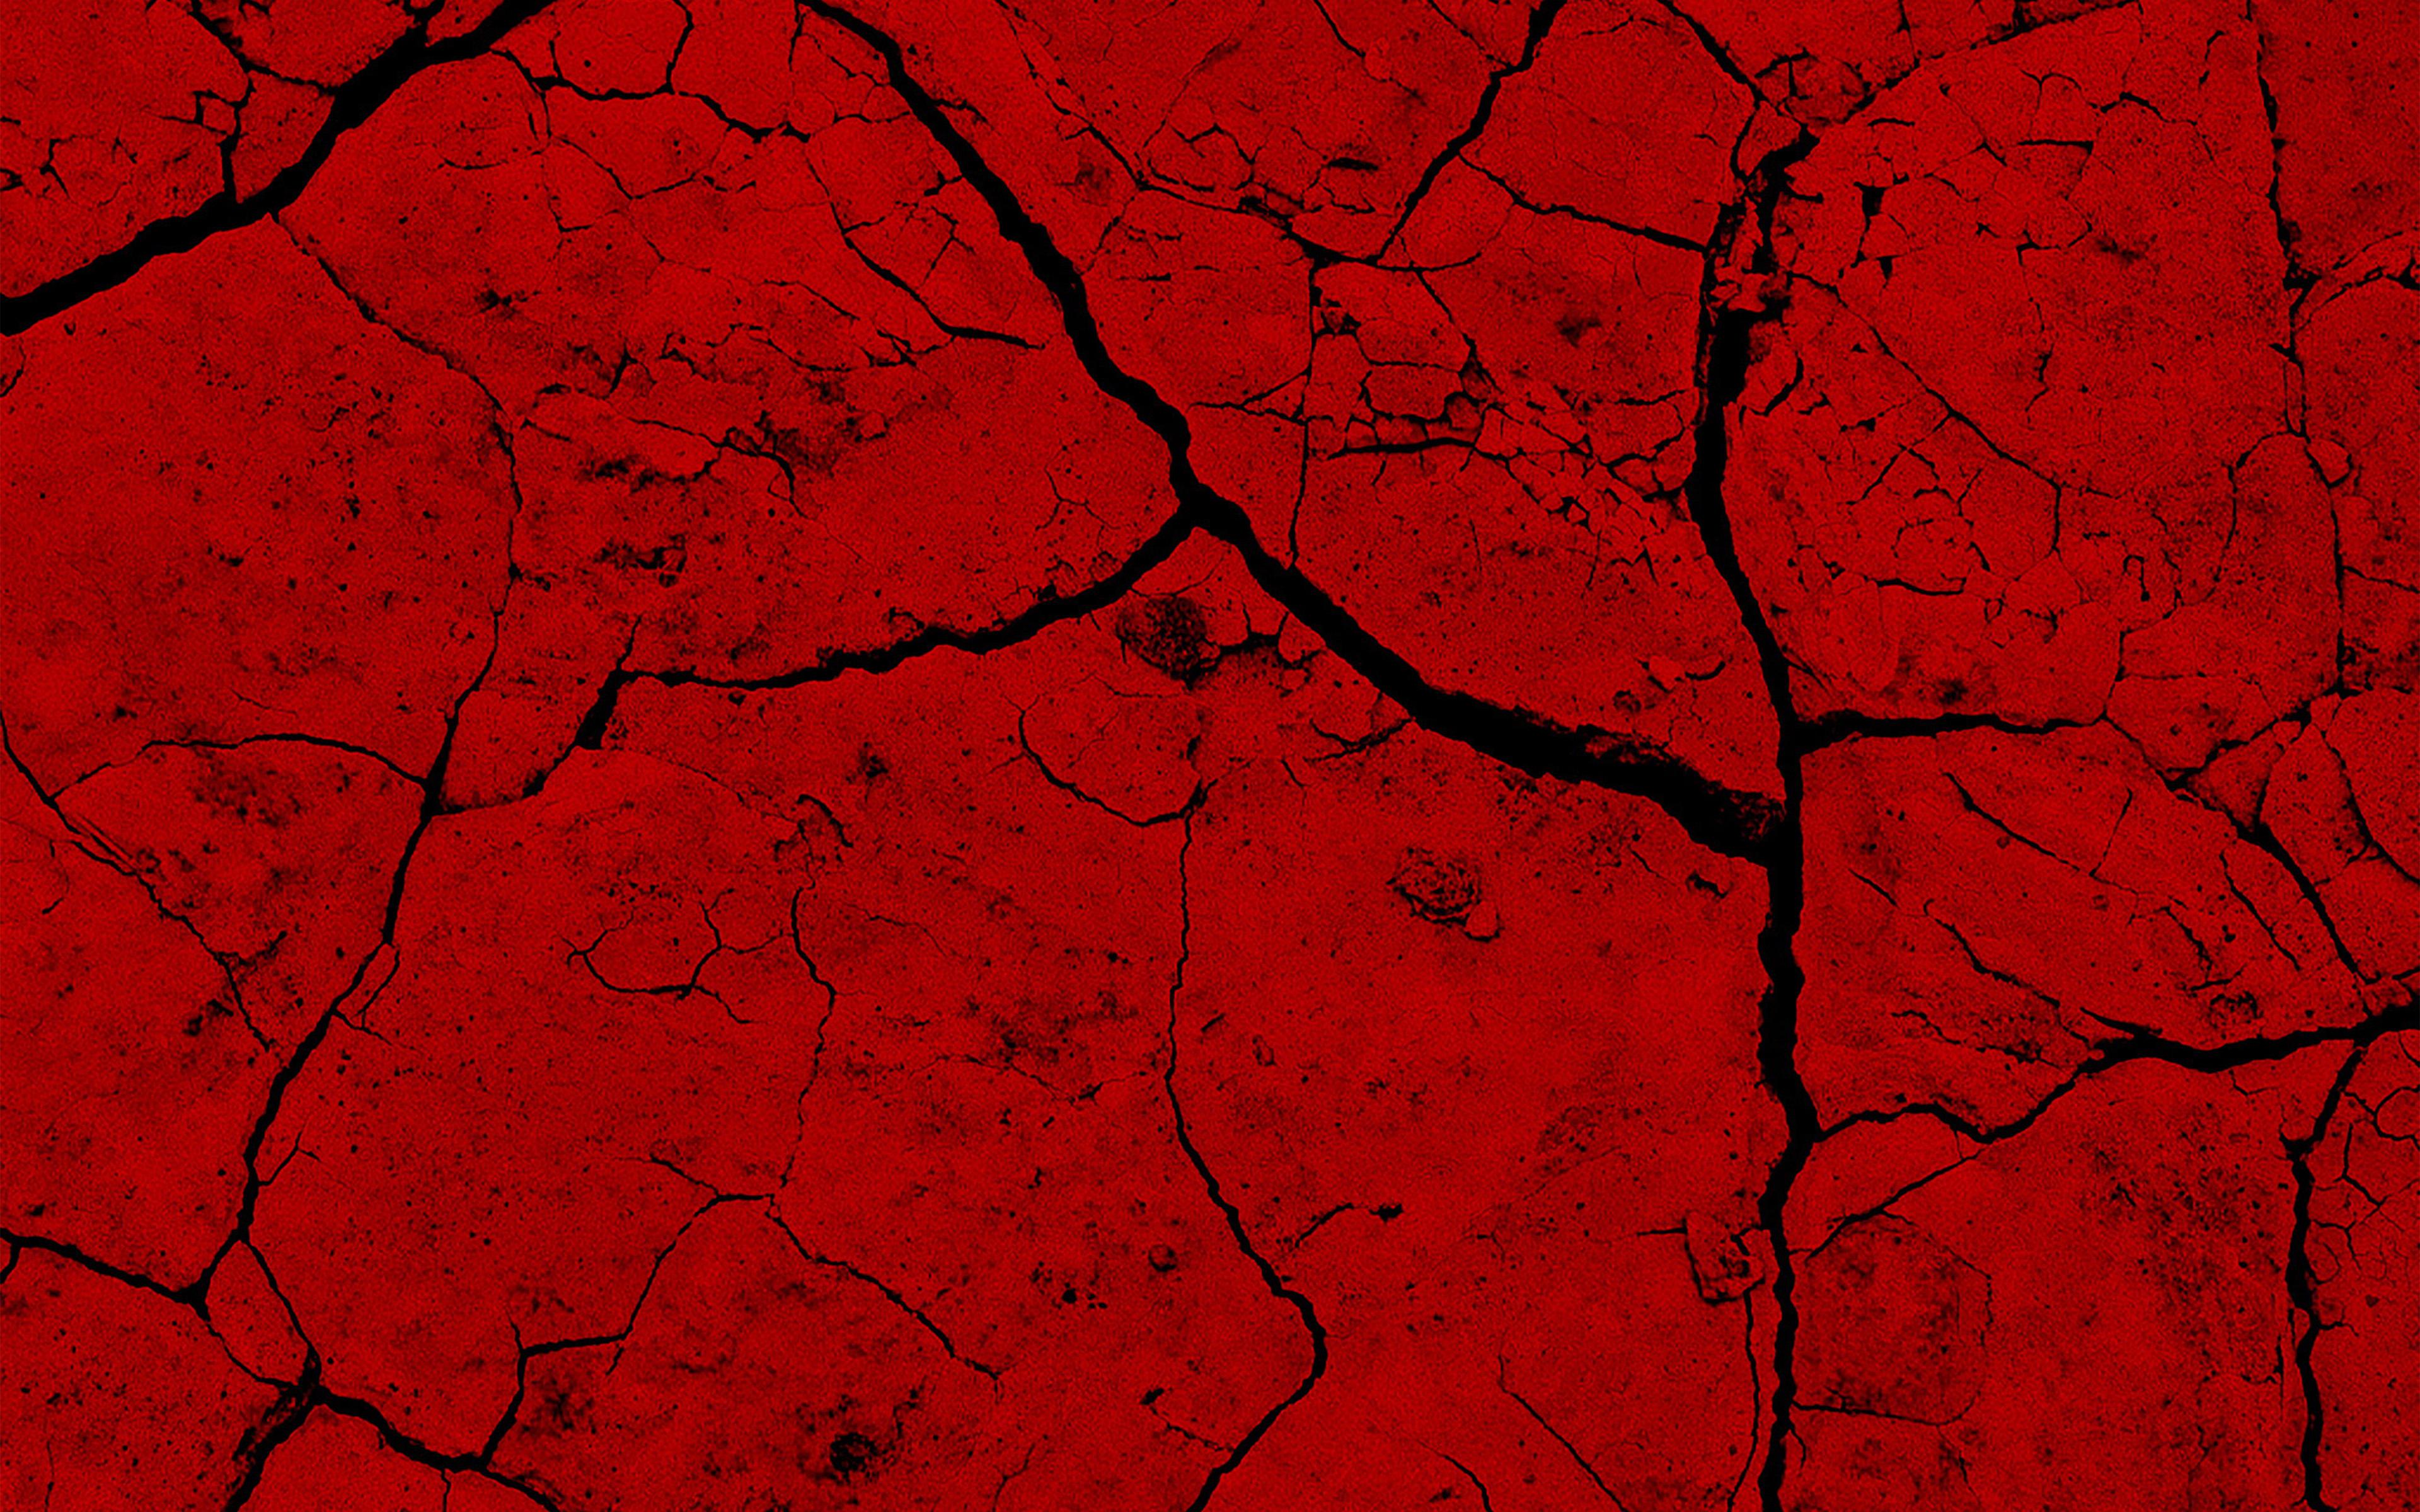 Vz80 Brick Crack Dessert Pattern Background Red Wallpaper